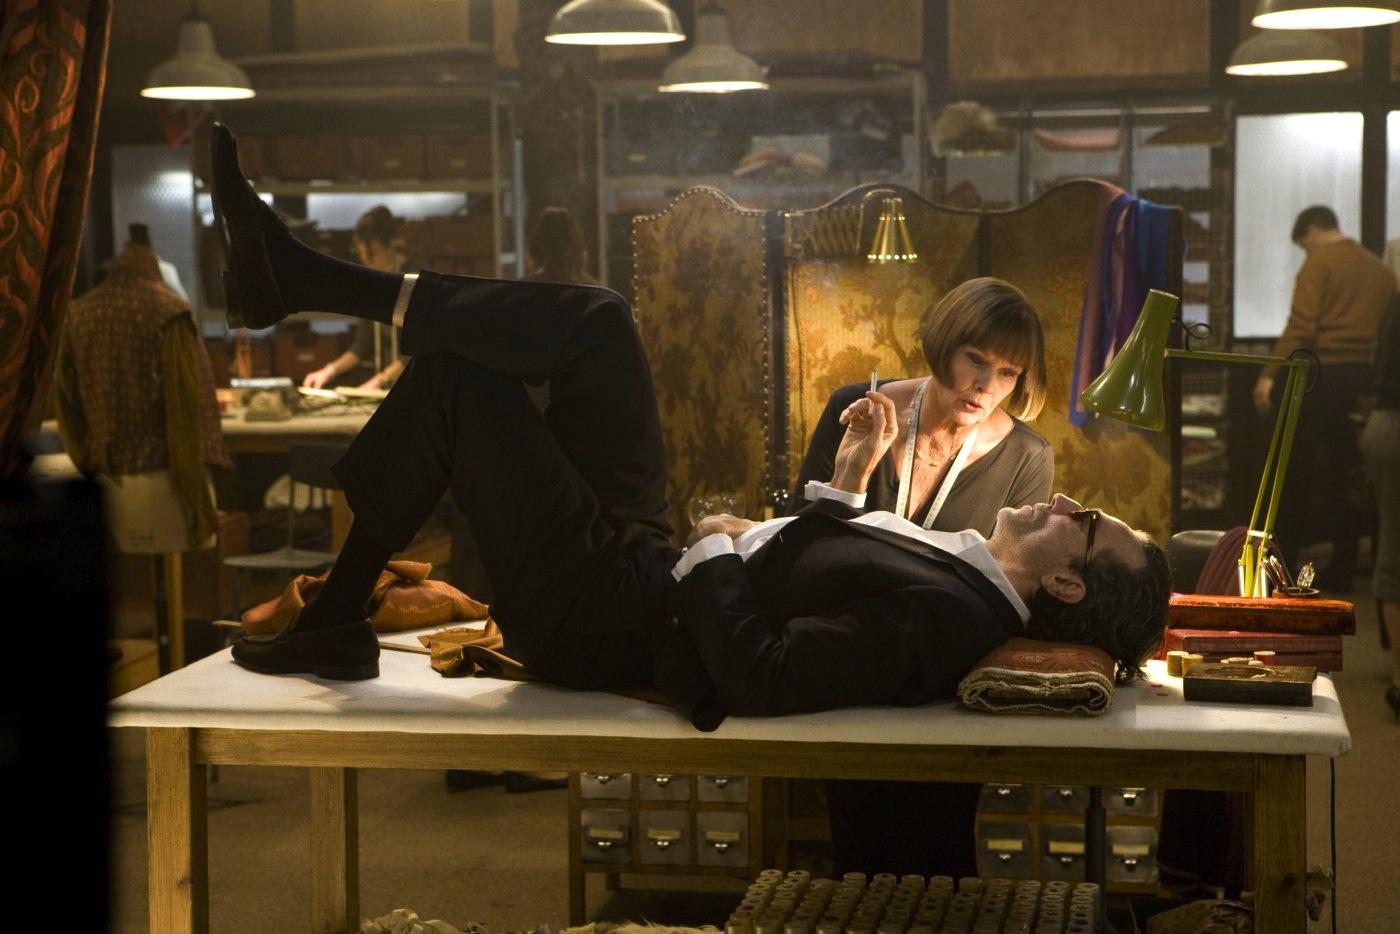 Nine (2009) Official Trailer #1 - Daniel Day-Lewis Movie HD